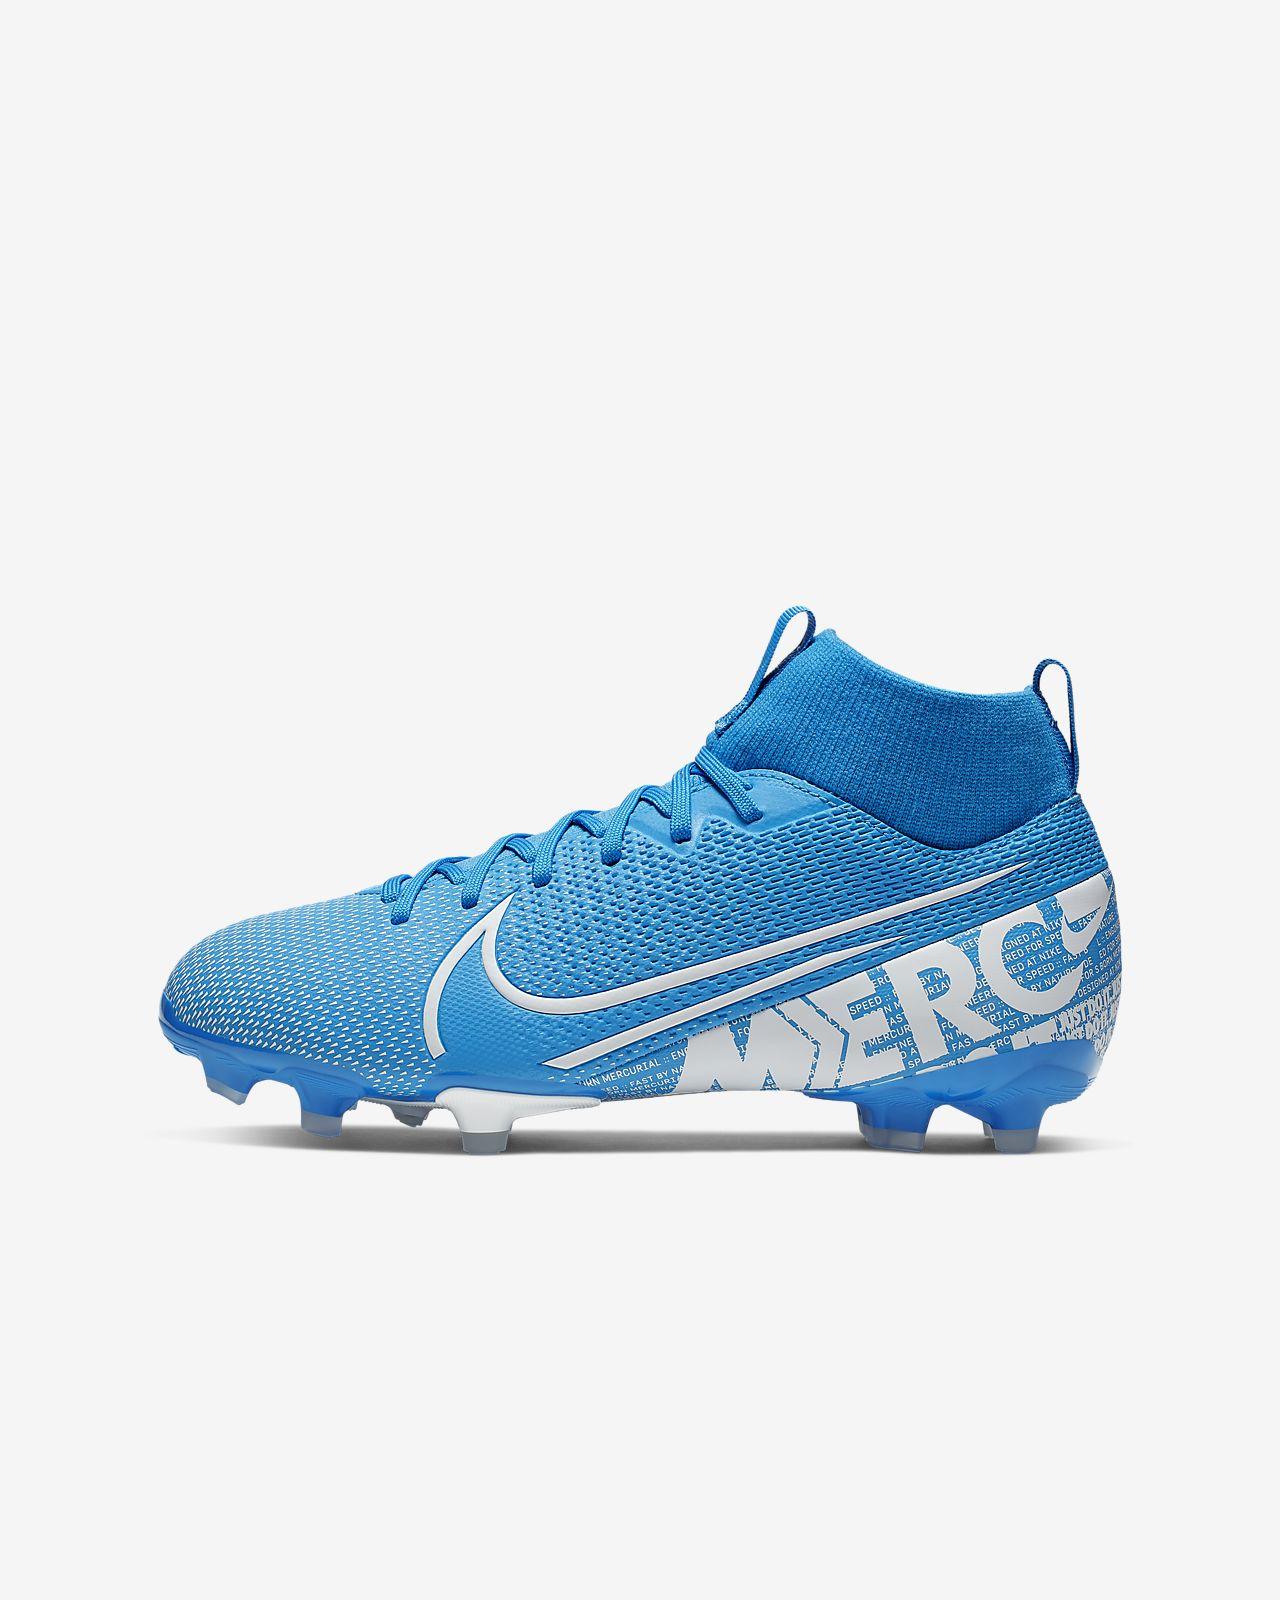 scarpe da calcio nike bambino mercurial superfly cr7 quinto